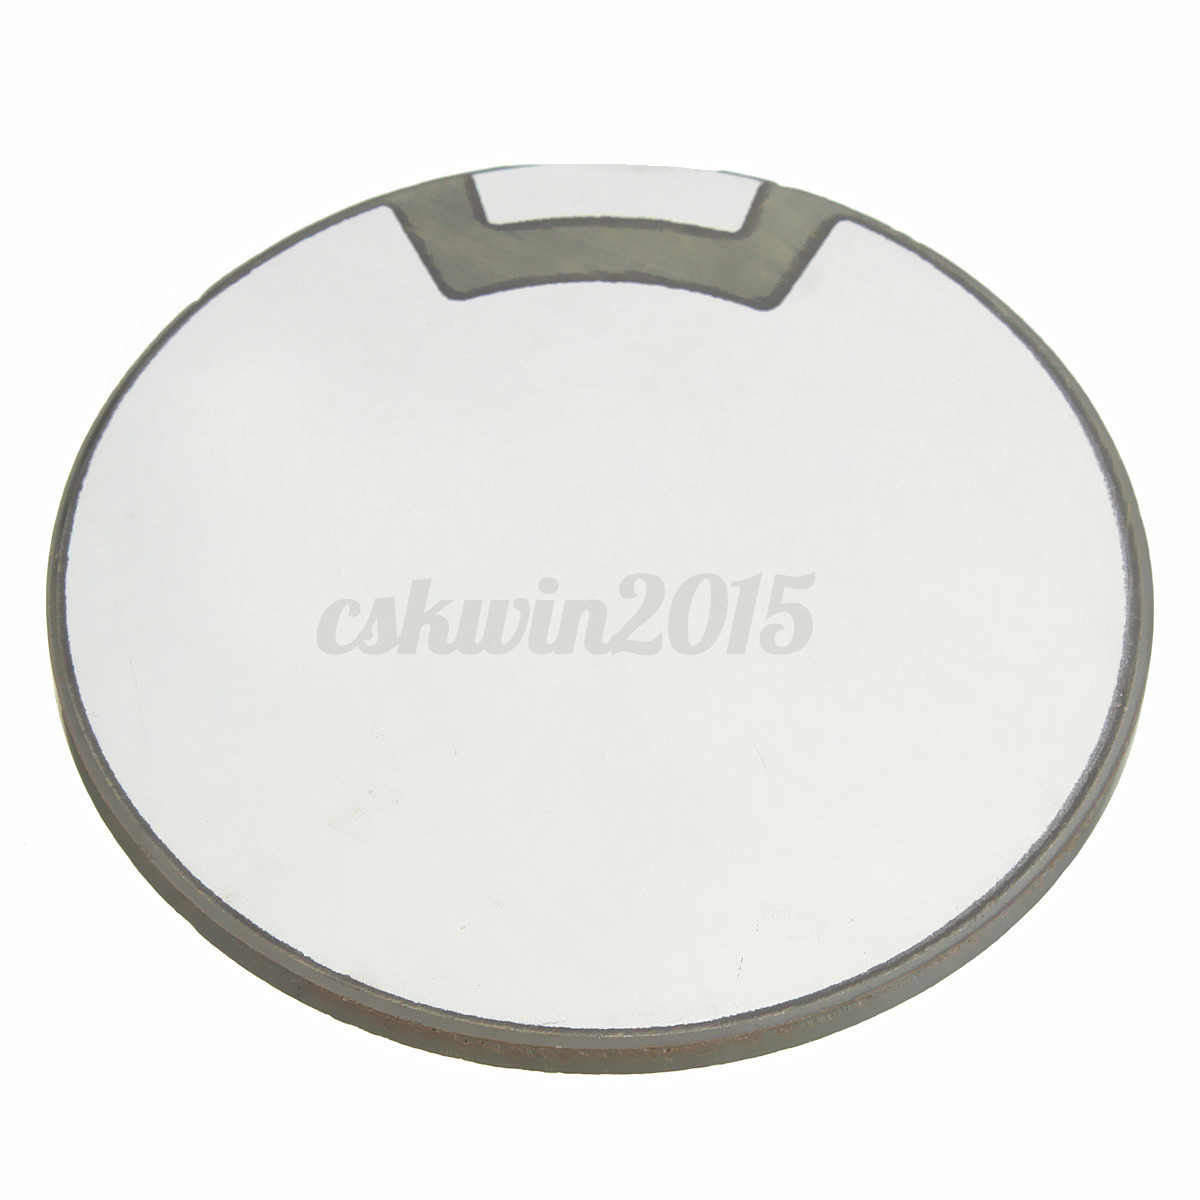 40khz 35w Ultrasonic Piezoelectric Clean Transducer Plate Electric Transducerultrasonic Humidifier Transducertransducer Detail Image